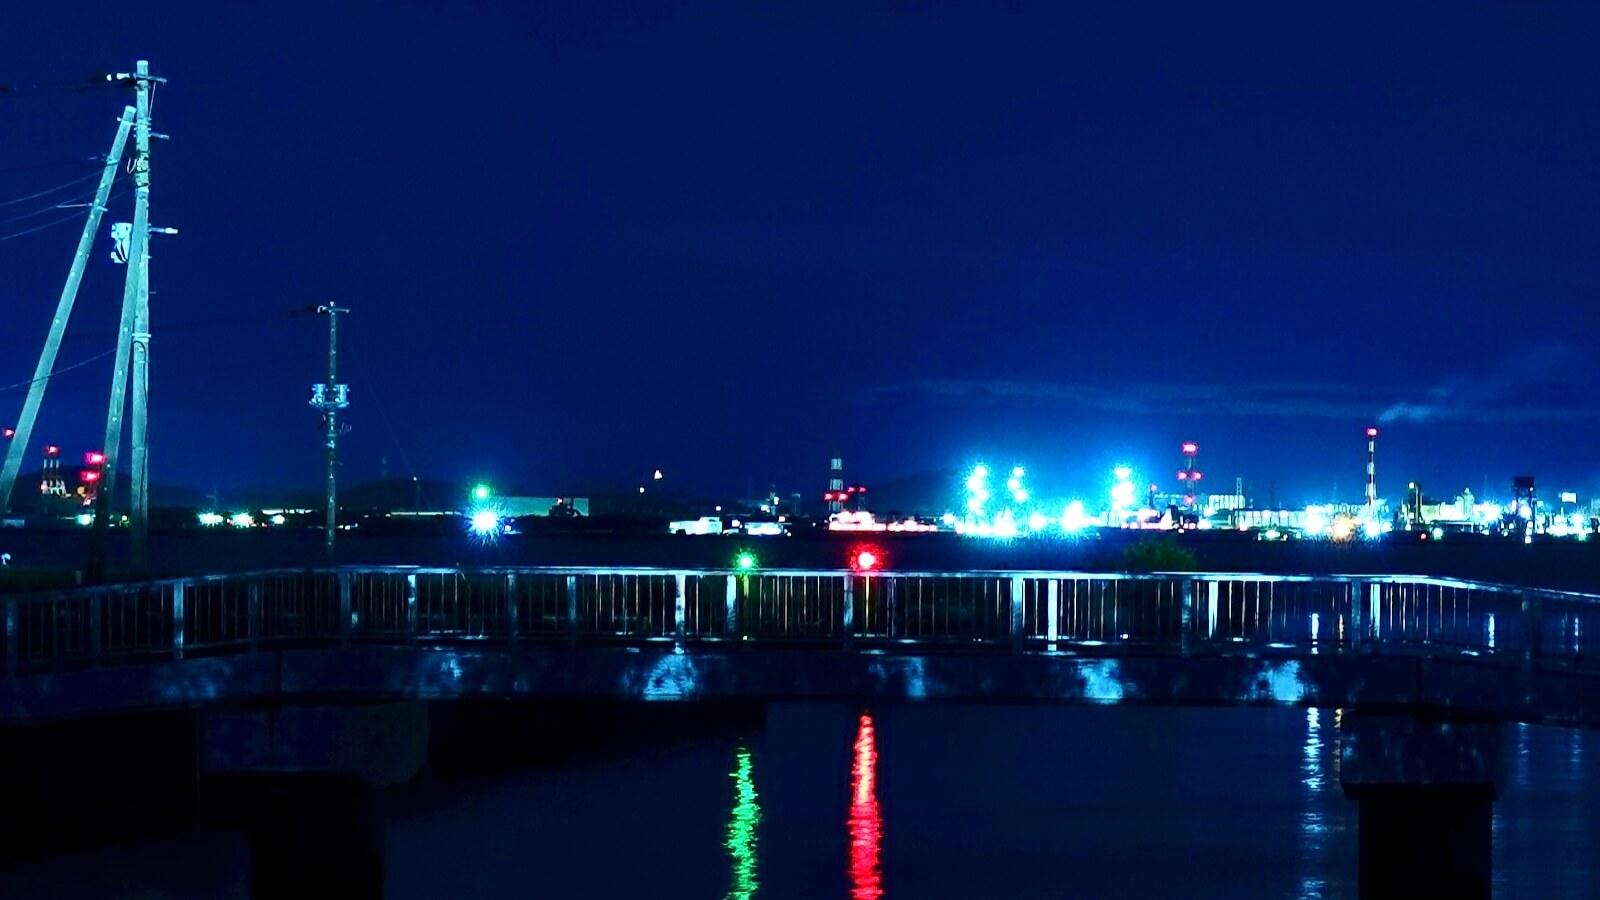 Egawa Beach at night taken with RX100M5A